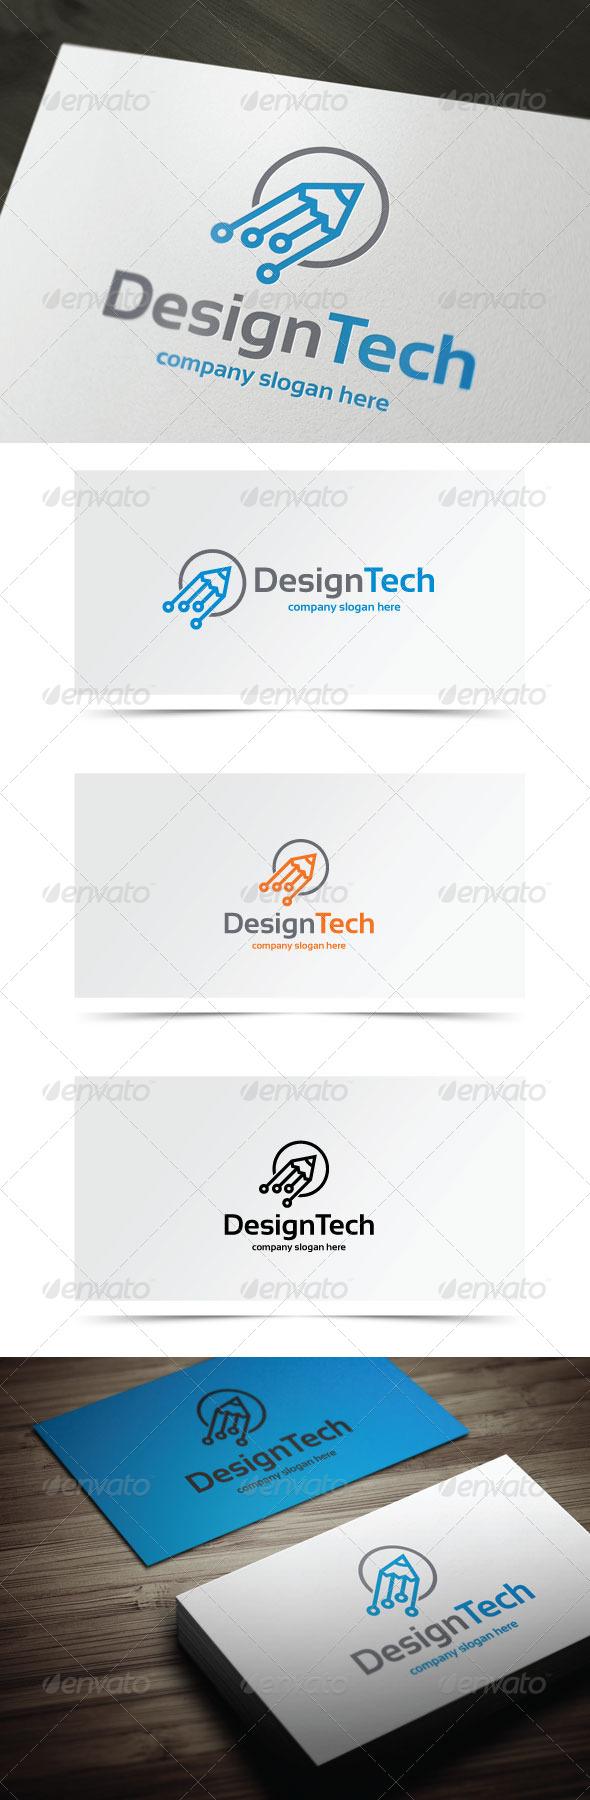 GraphicRiver Design Tech 7553953